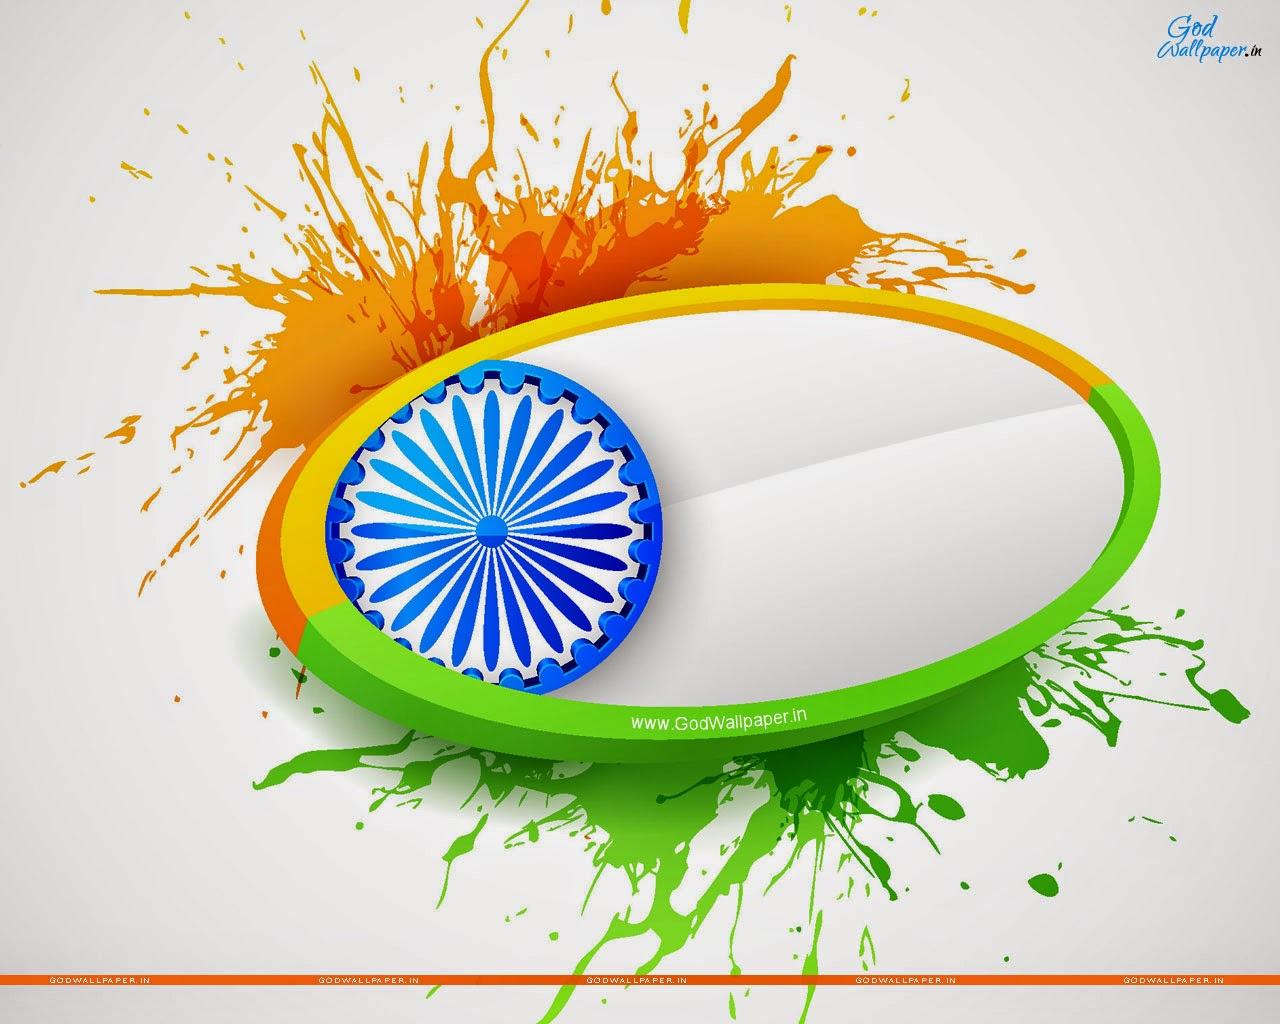 Latest Indian Flag Wallpaper - Tiranga Wallpaper ~ Hd Wallpaper Collection